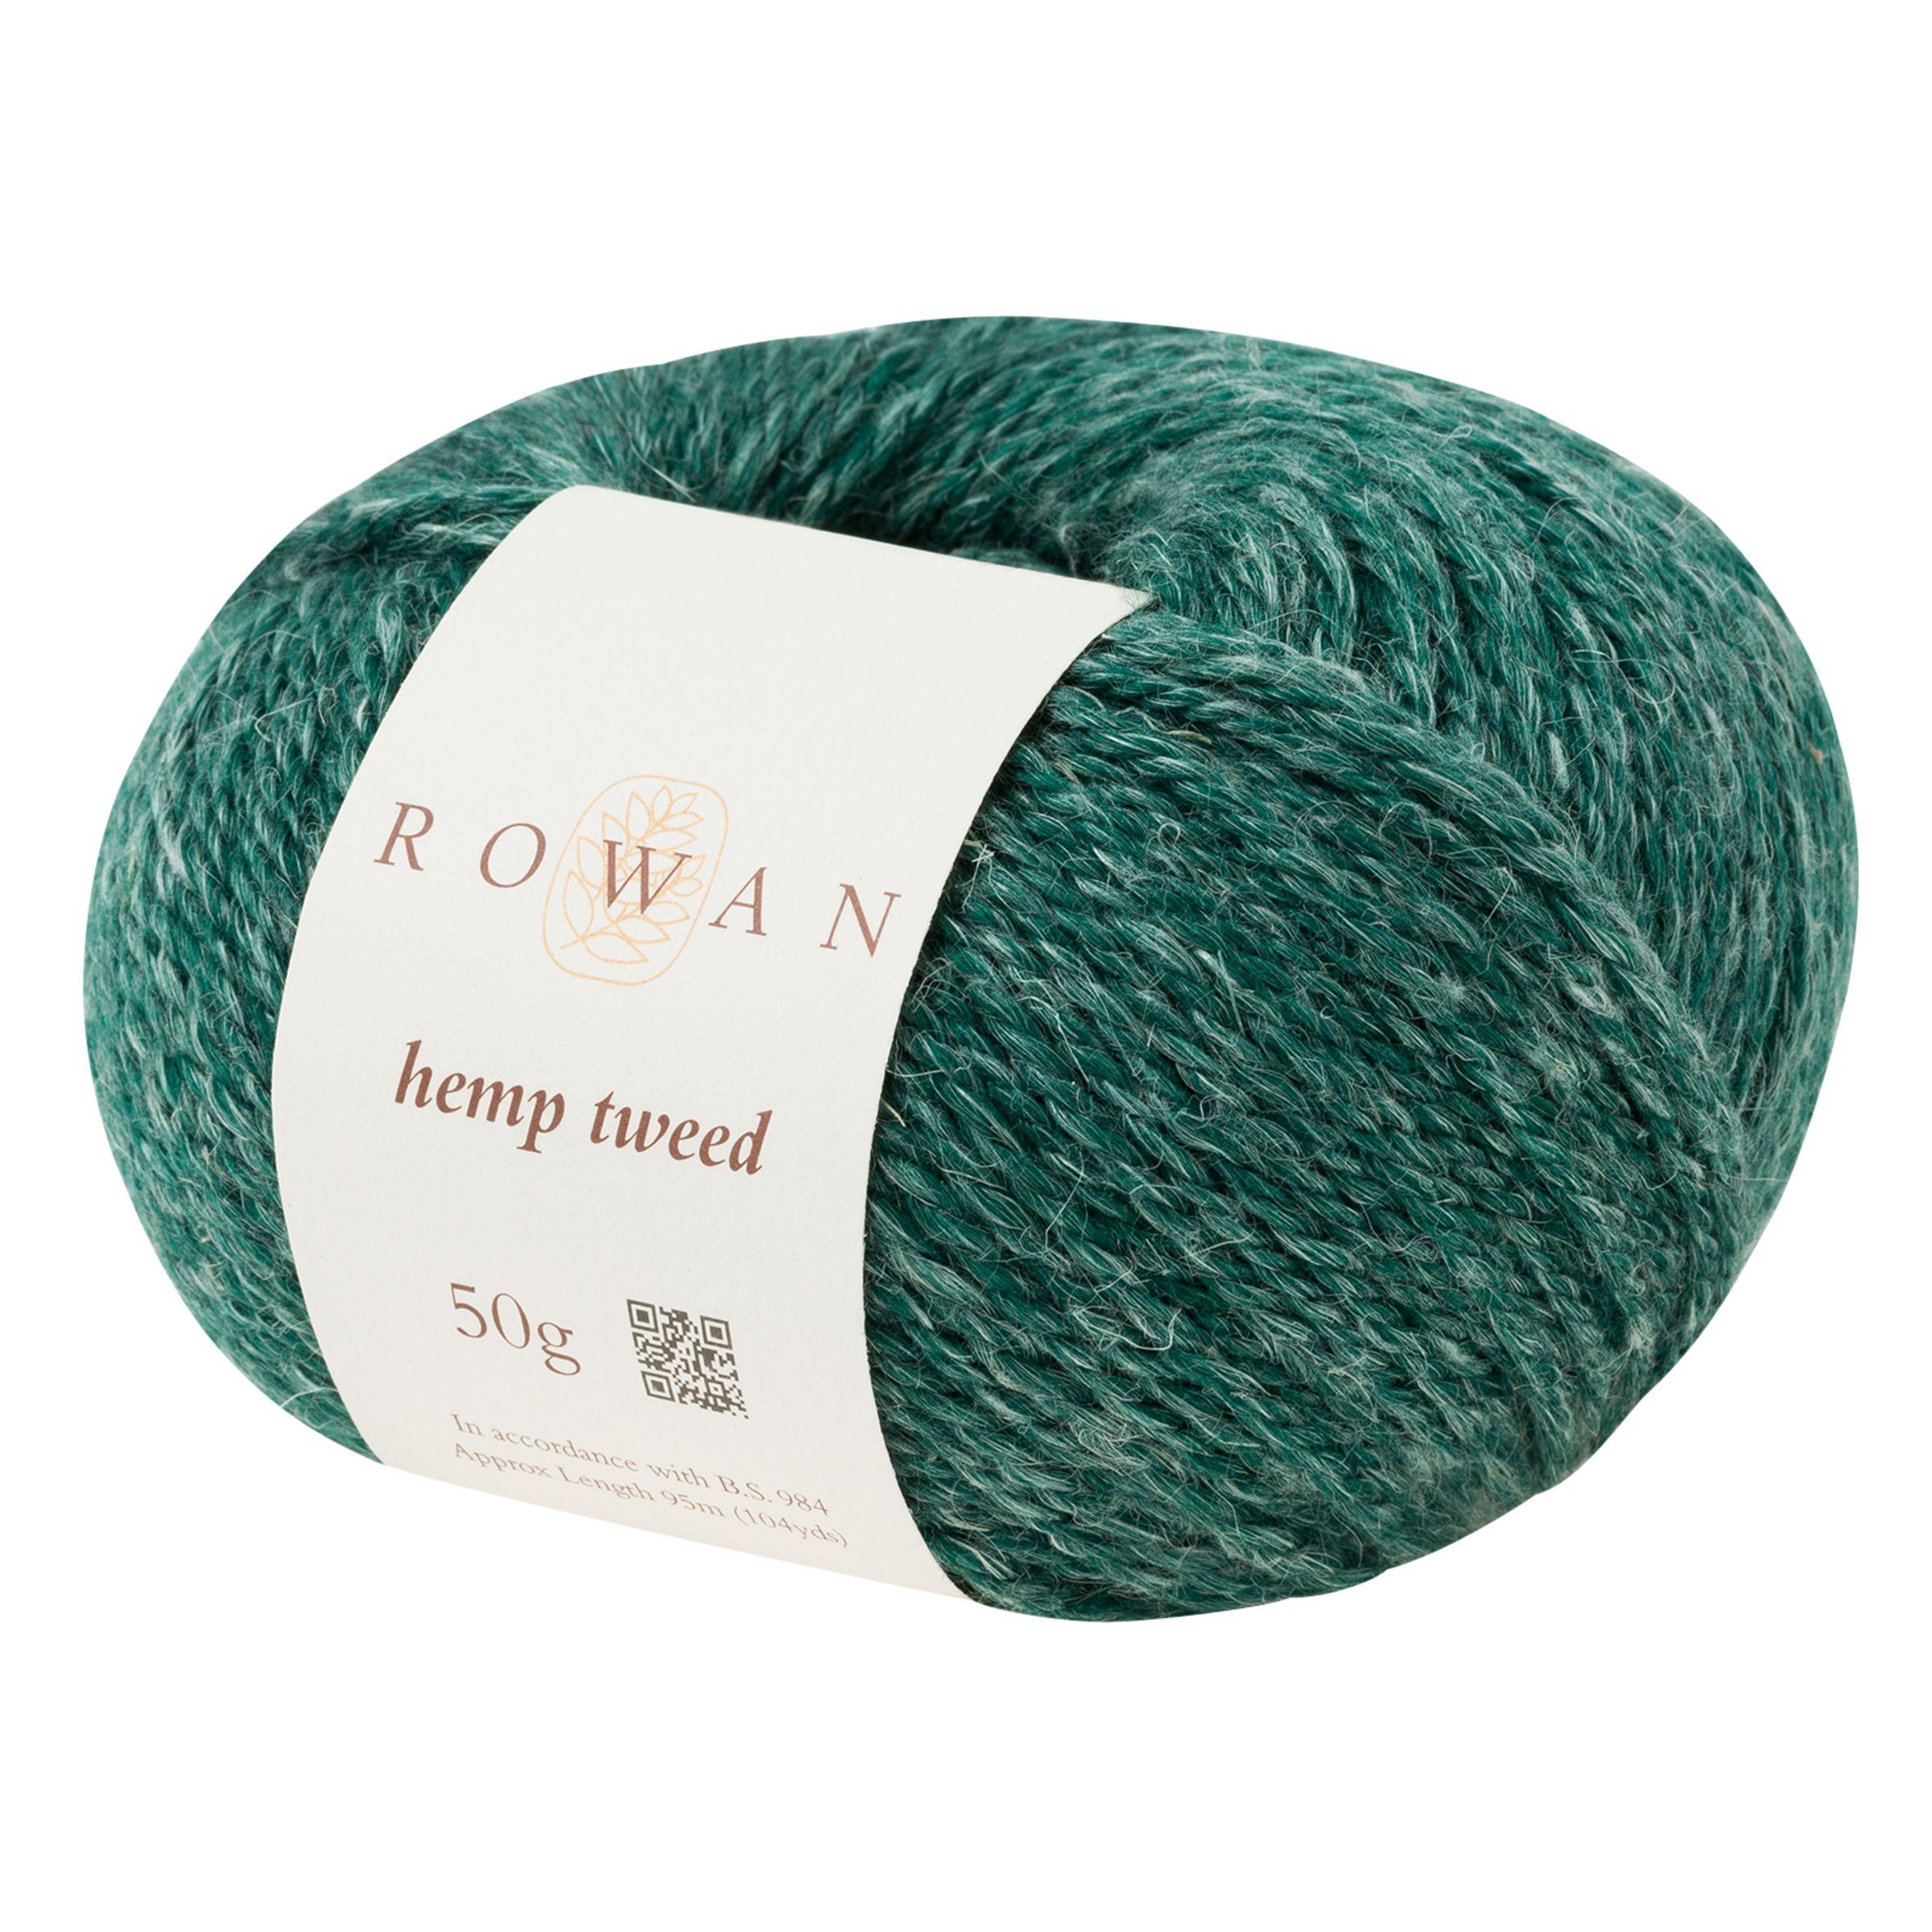 Rowan Rowan Hemp Tweed Yarn, 50g